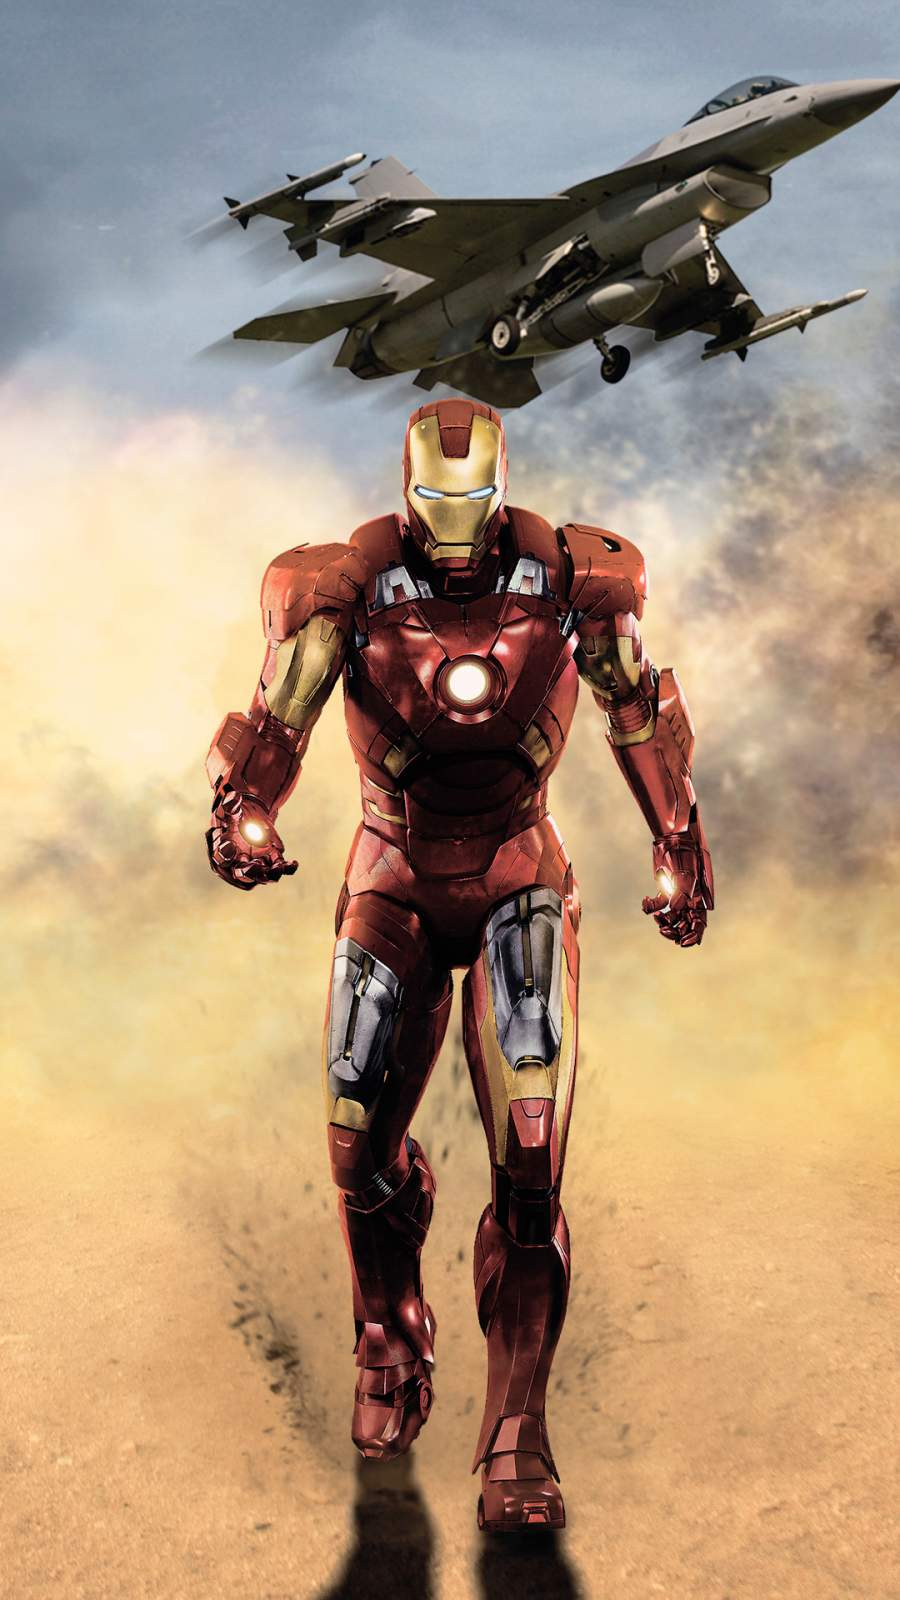 Iron Man vs Fighter Jet iPhone Wallpaper